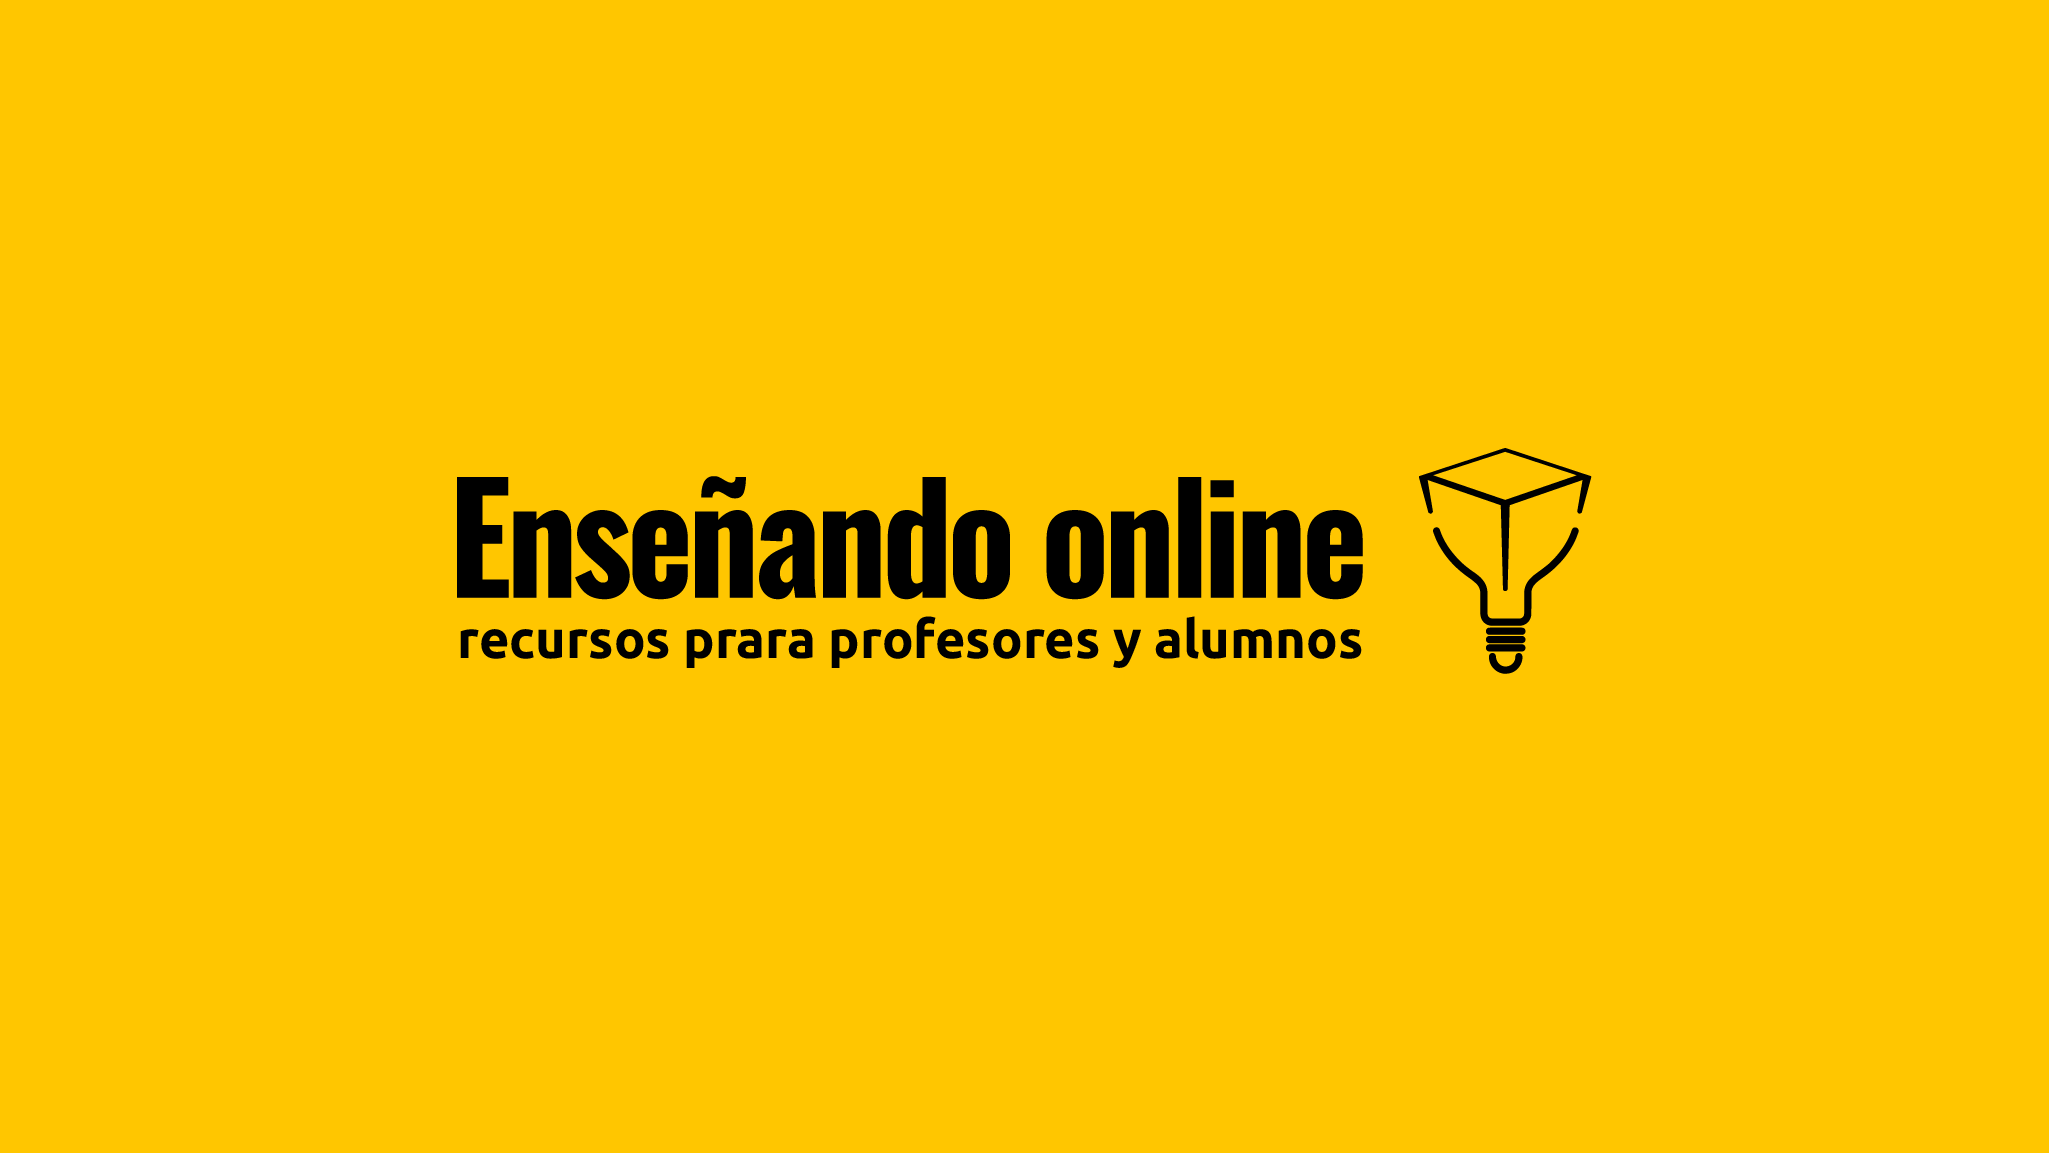 logotipo Enseñando online